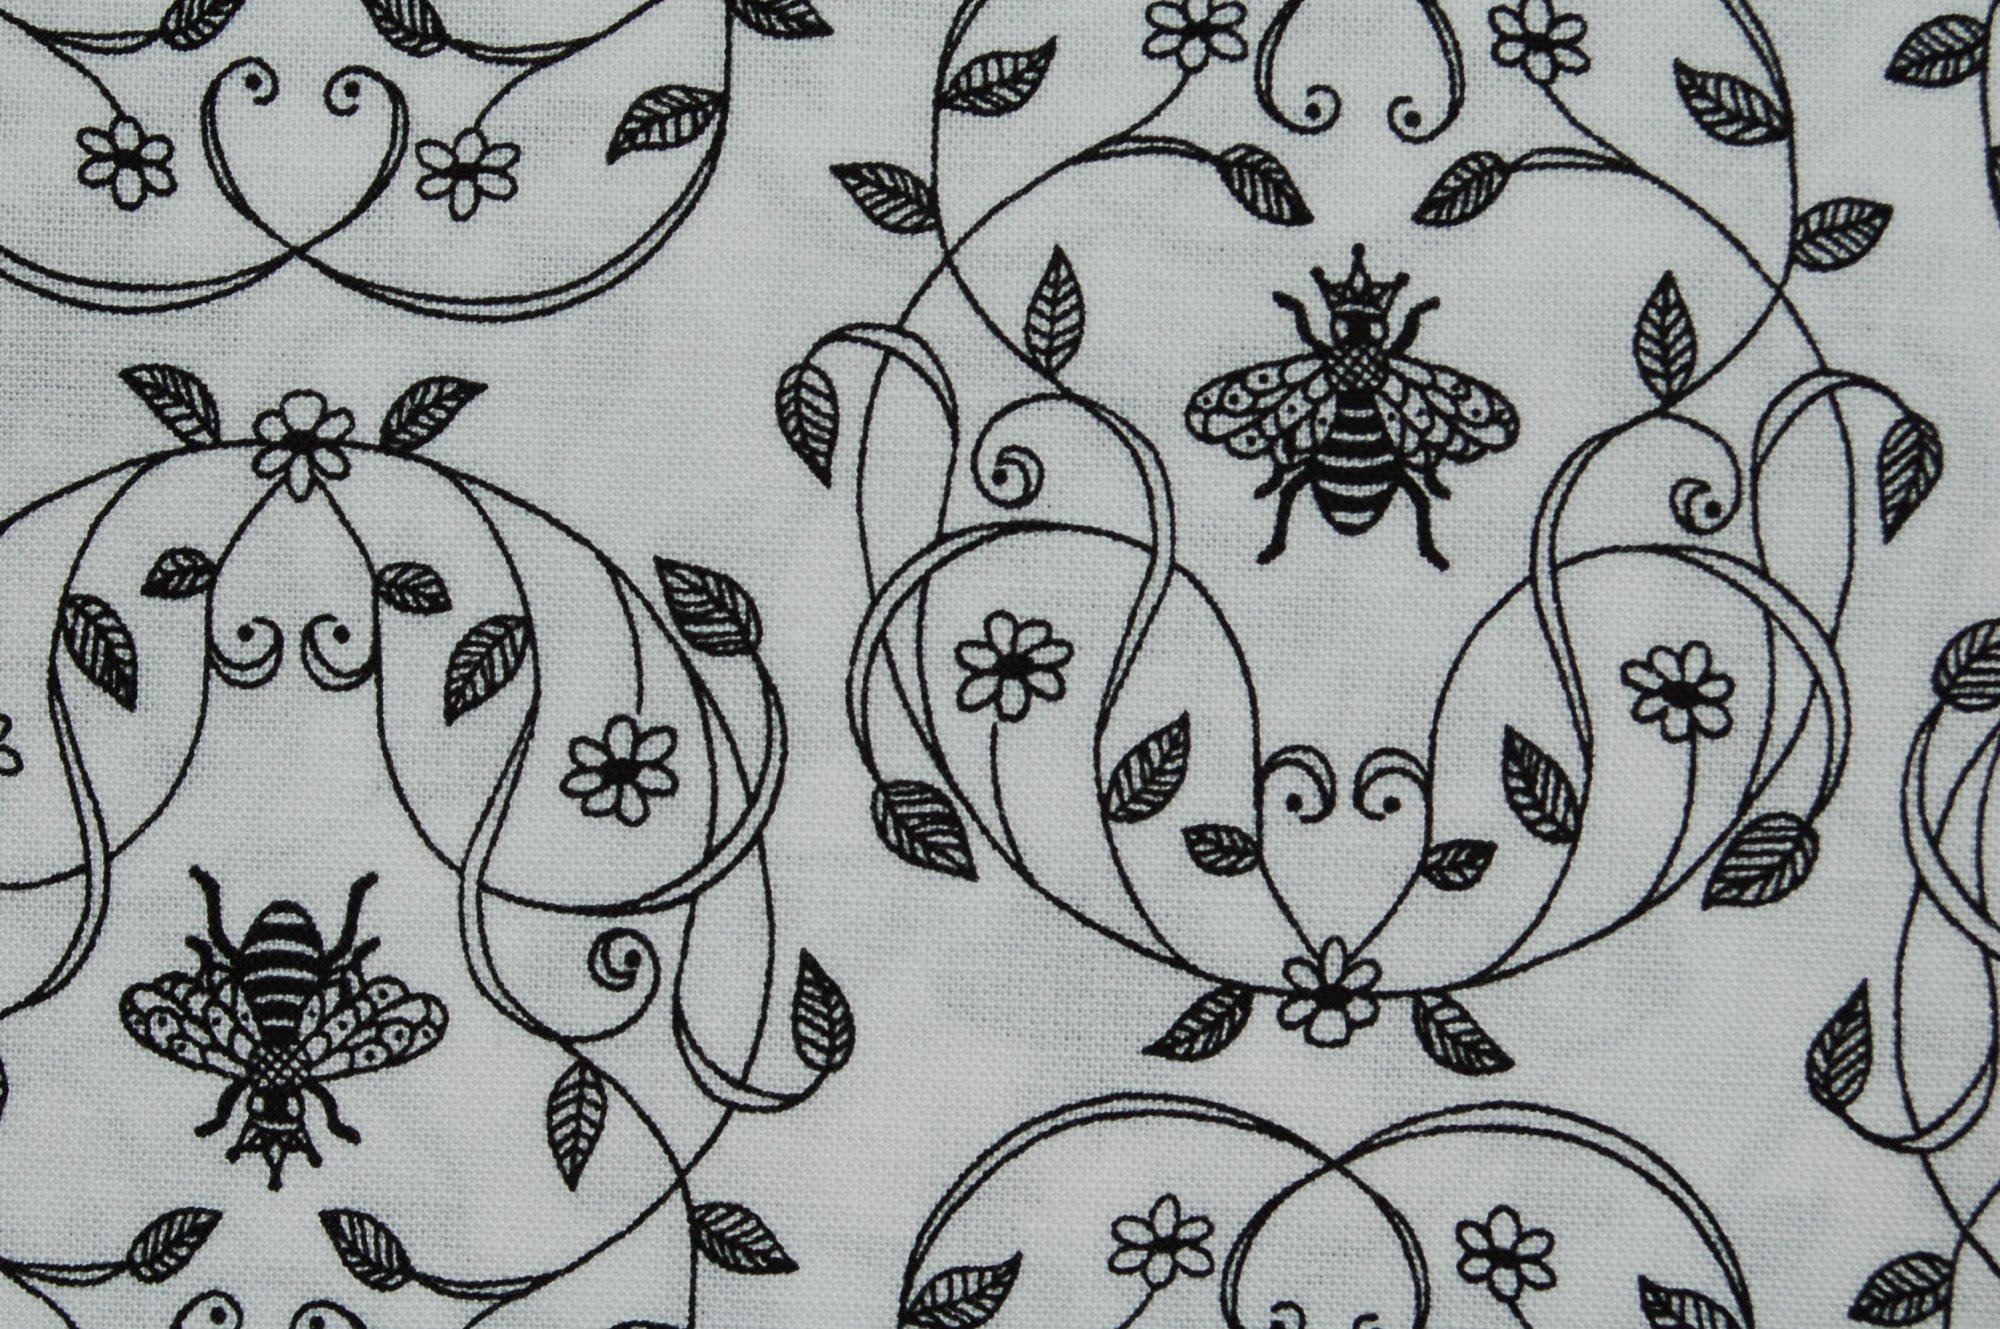 Honey Run Queen by Jill Finley for Penny Rose Fabrics